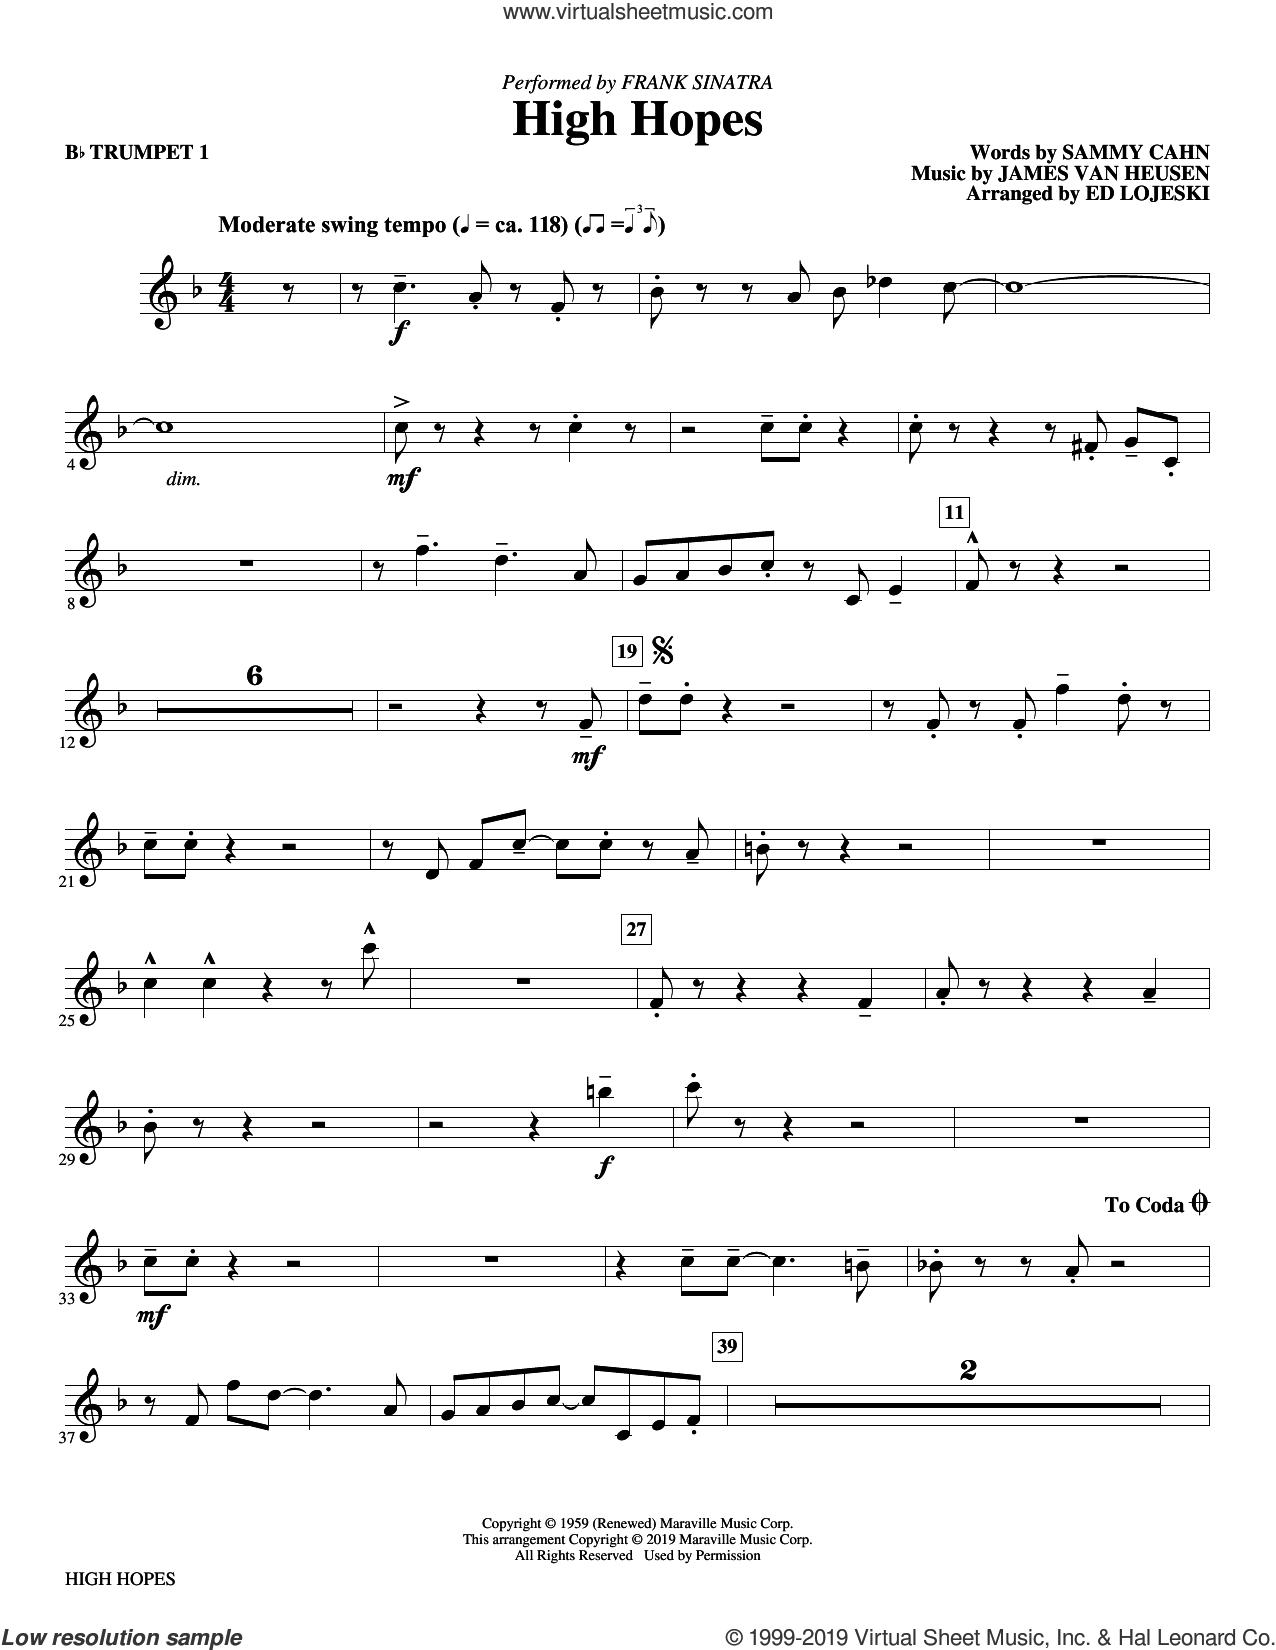 High Hopes (arr. Ed Lojeski) (complete set of parts) sheet music for orchestra/band by Frank Sinatra, Ed Lojeski, Jimmy van Heusen and Sammy Cahn, intermediate skill level